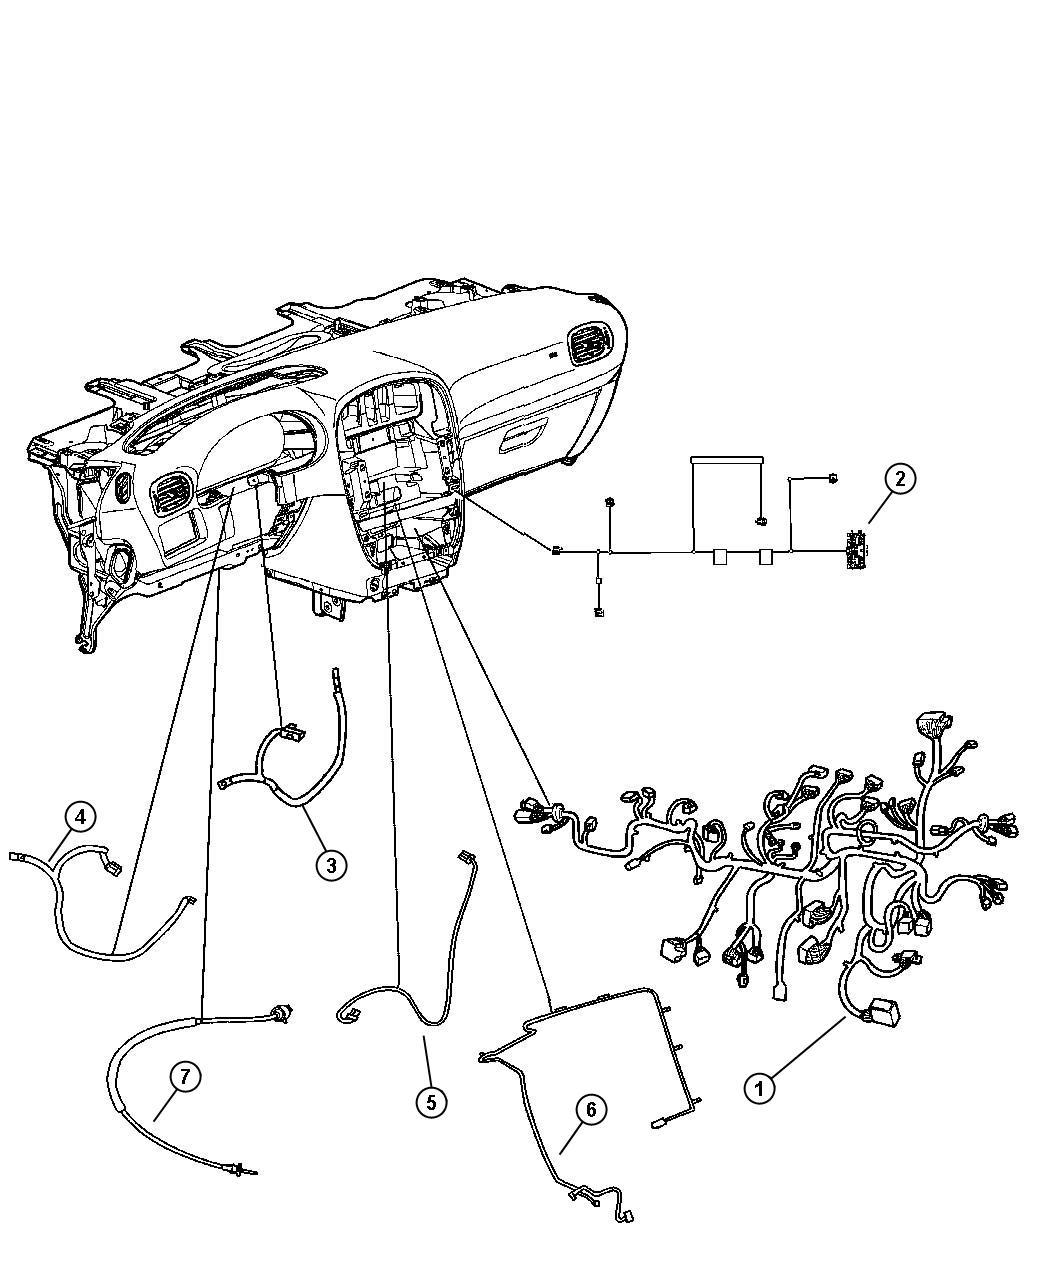 04869093AD - Chrysler Wiring. Instrument panel | Mopar ...